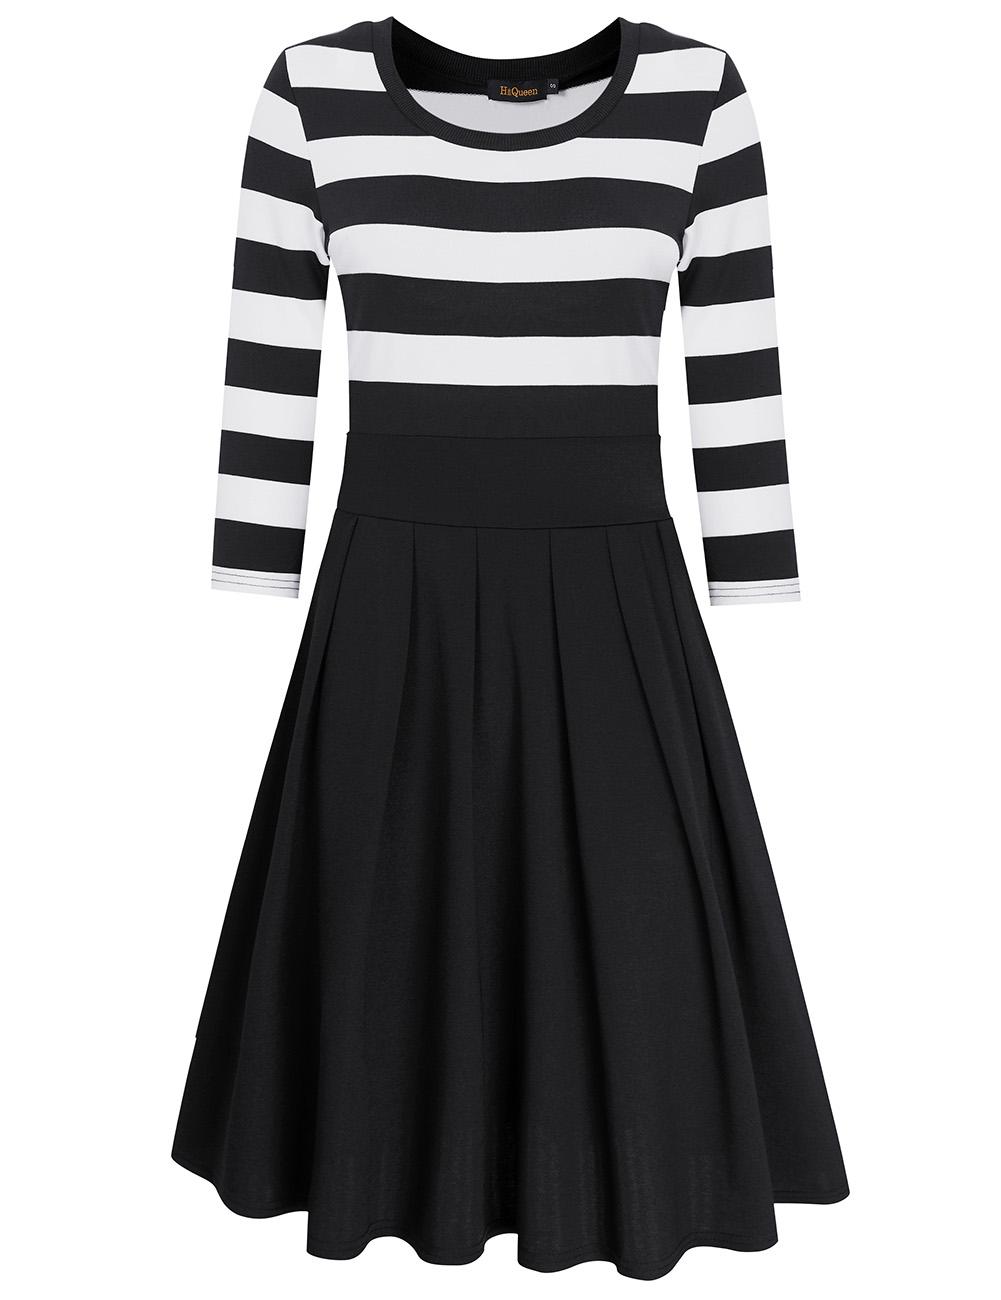 HiQueen Women Casual Scoop Neck 3/4 Sleeve A-Line Swing Dress Stripe Modest Dresses Black_L